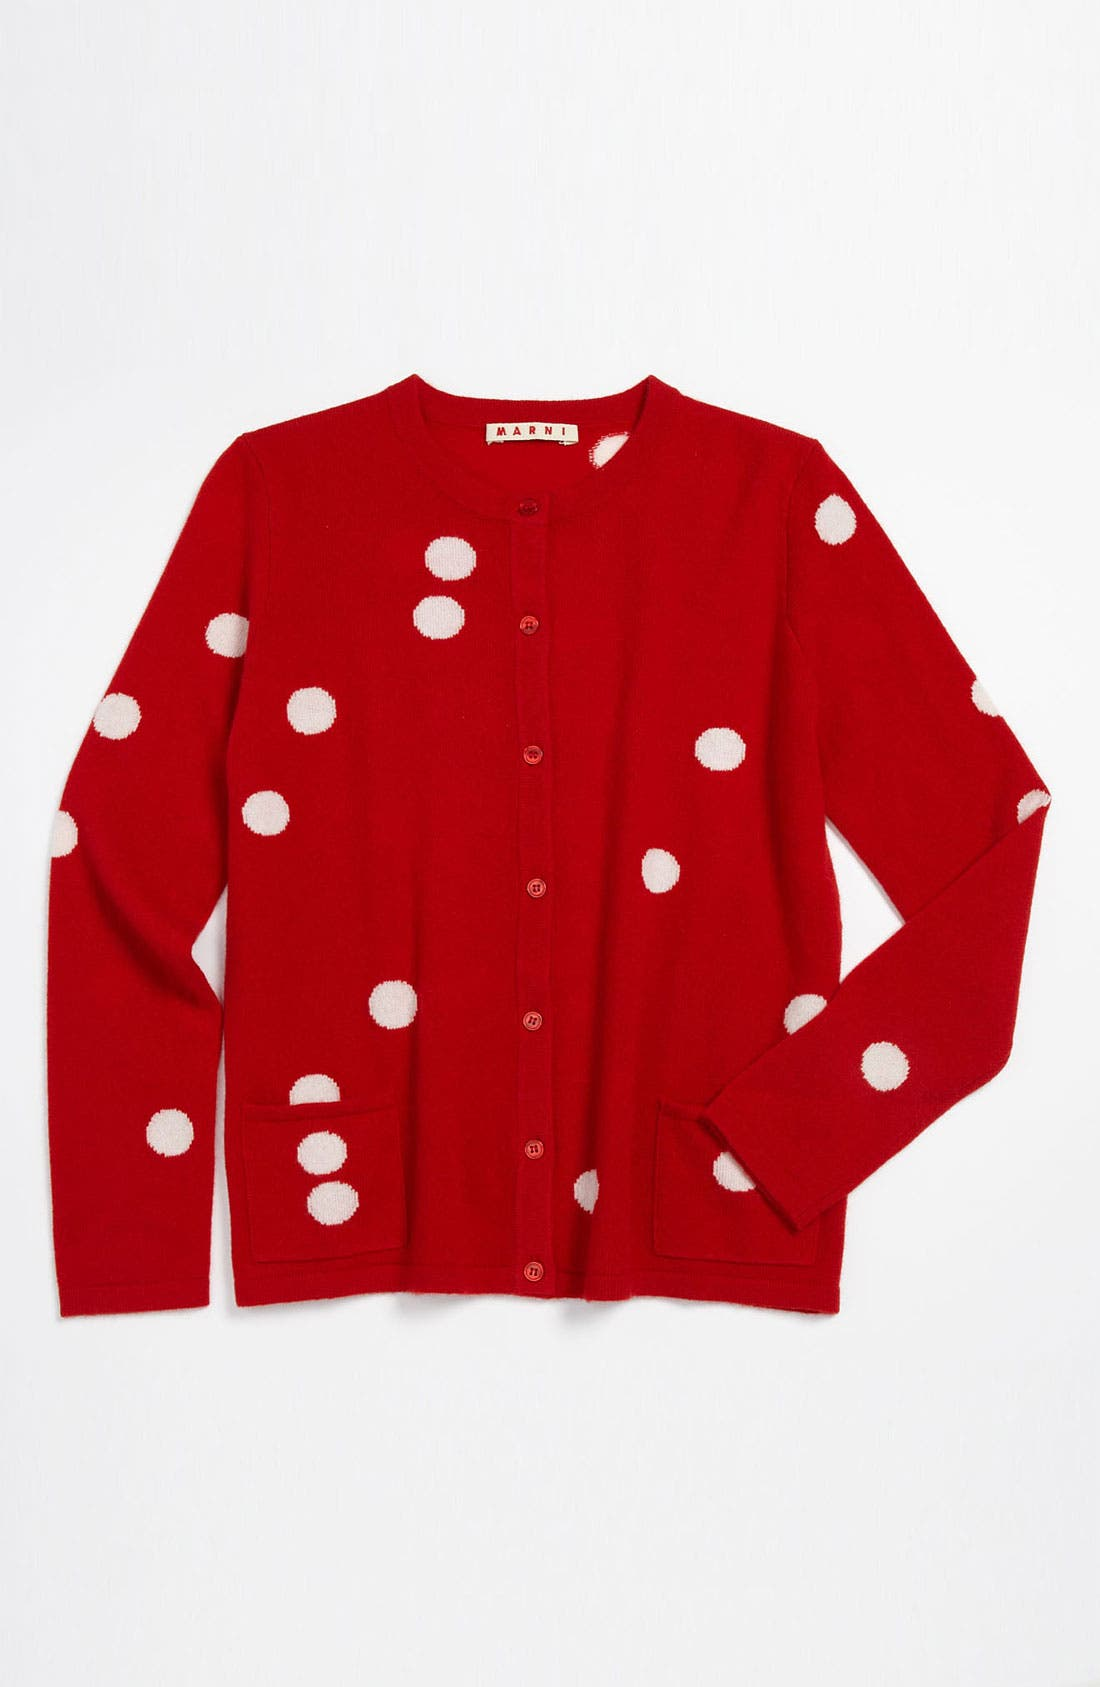 Alternate Image 1 Selected - Marni 'Maglieria' Cashmere Button Cardigan (Little Girls & Big Girls)